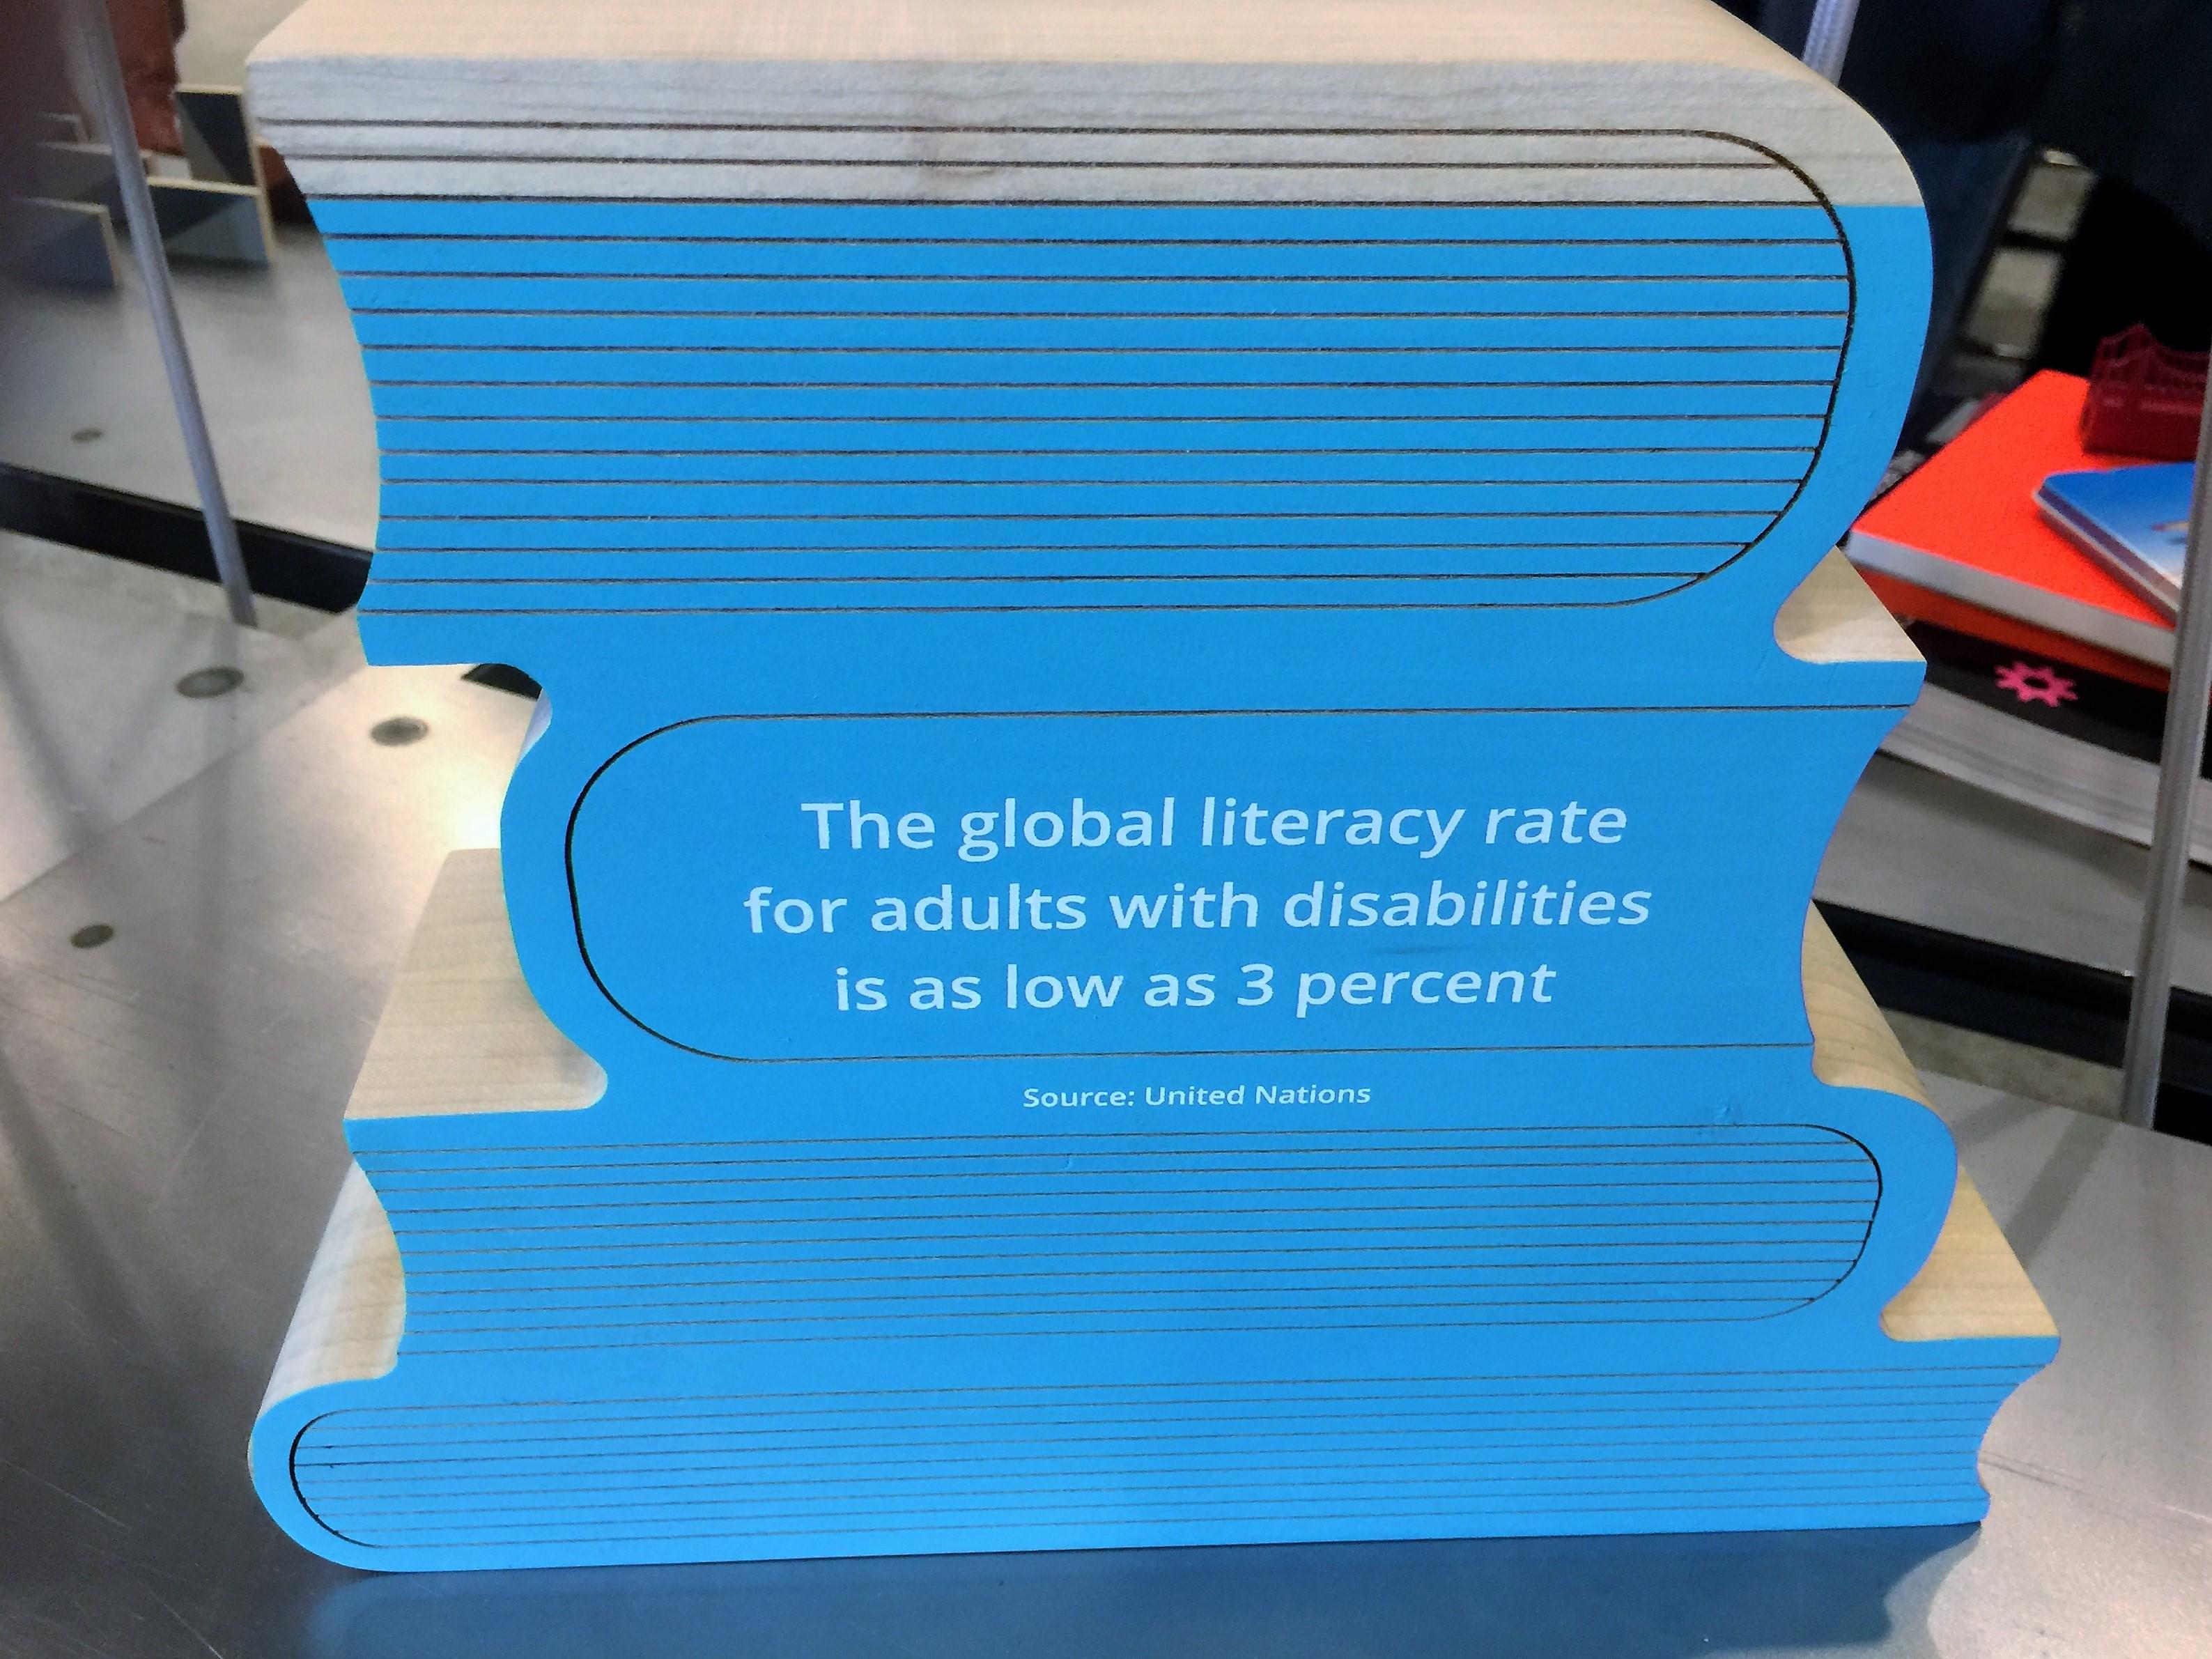 GlobalLiteracyDisabilities